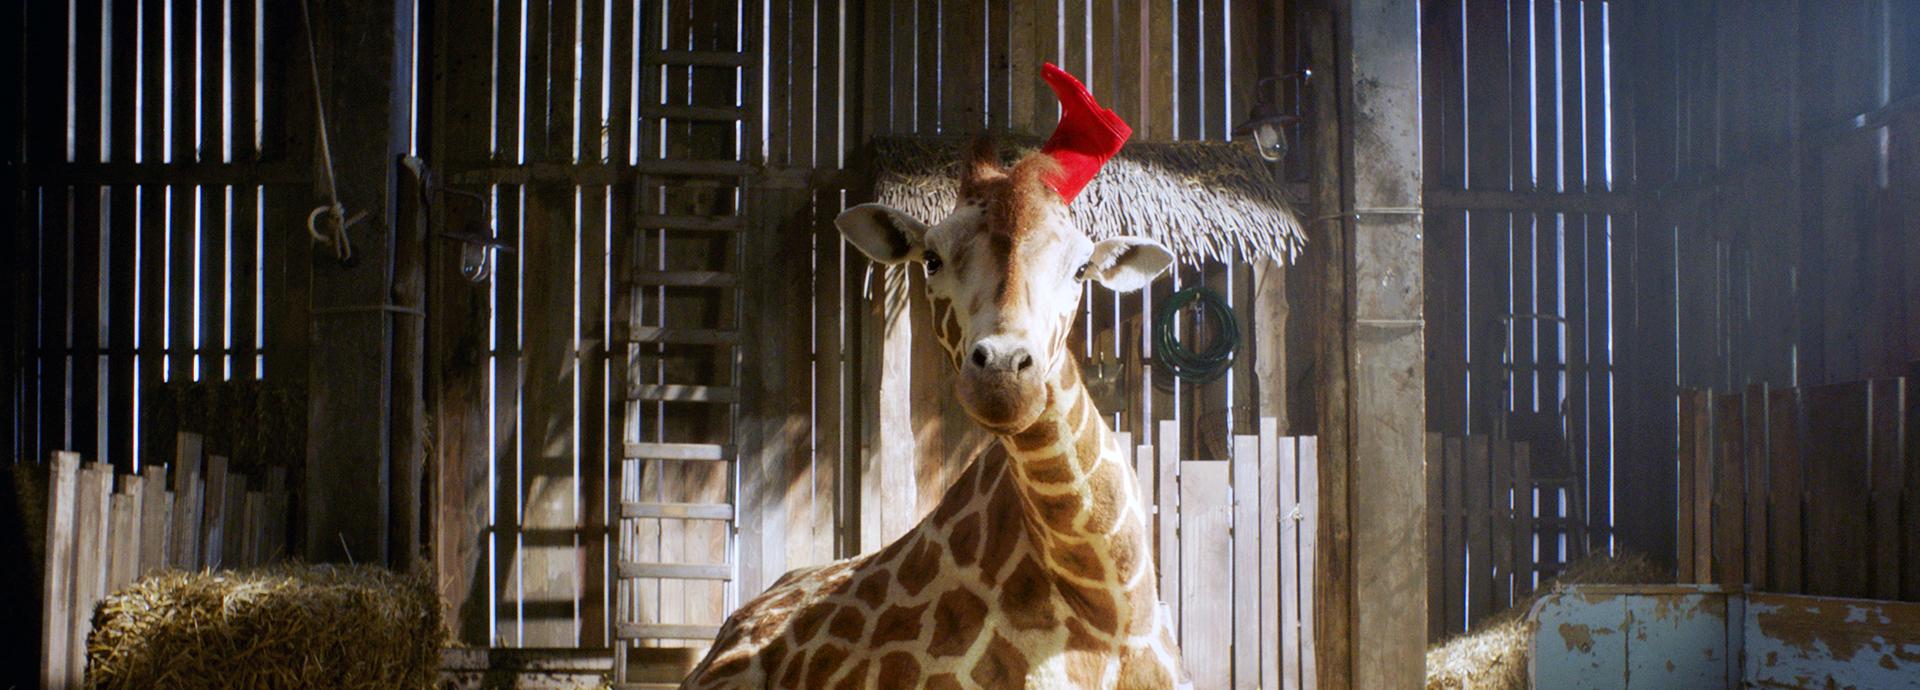 MeinFreundDieGiraffe-WEB2